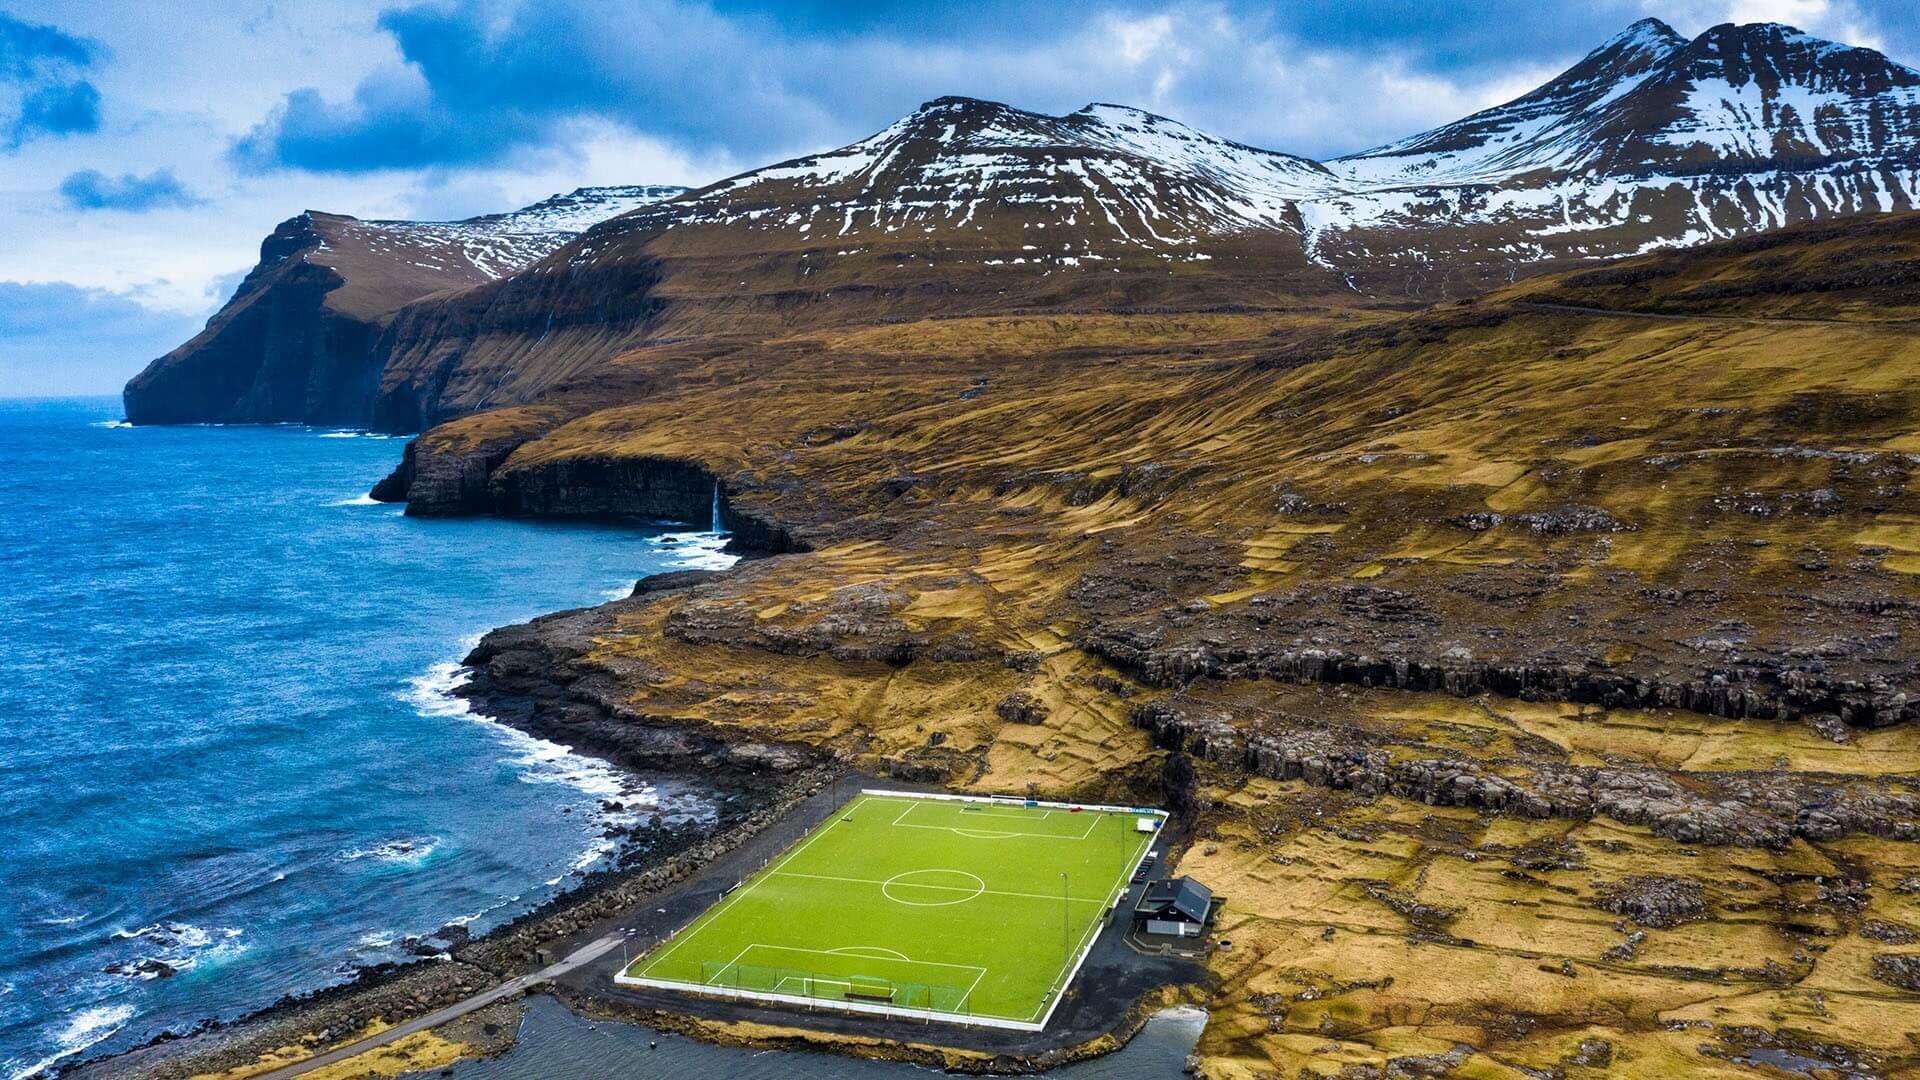 terrains de football les plus insolites